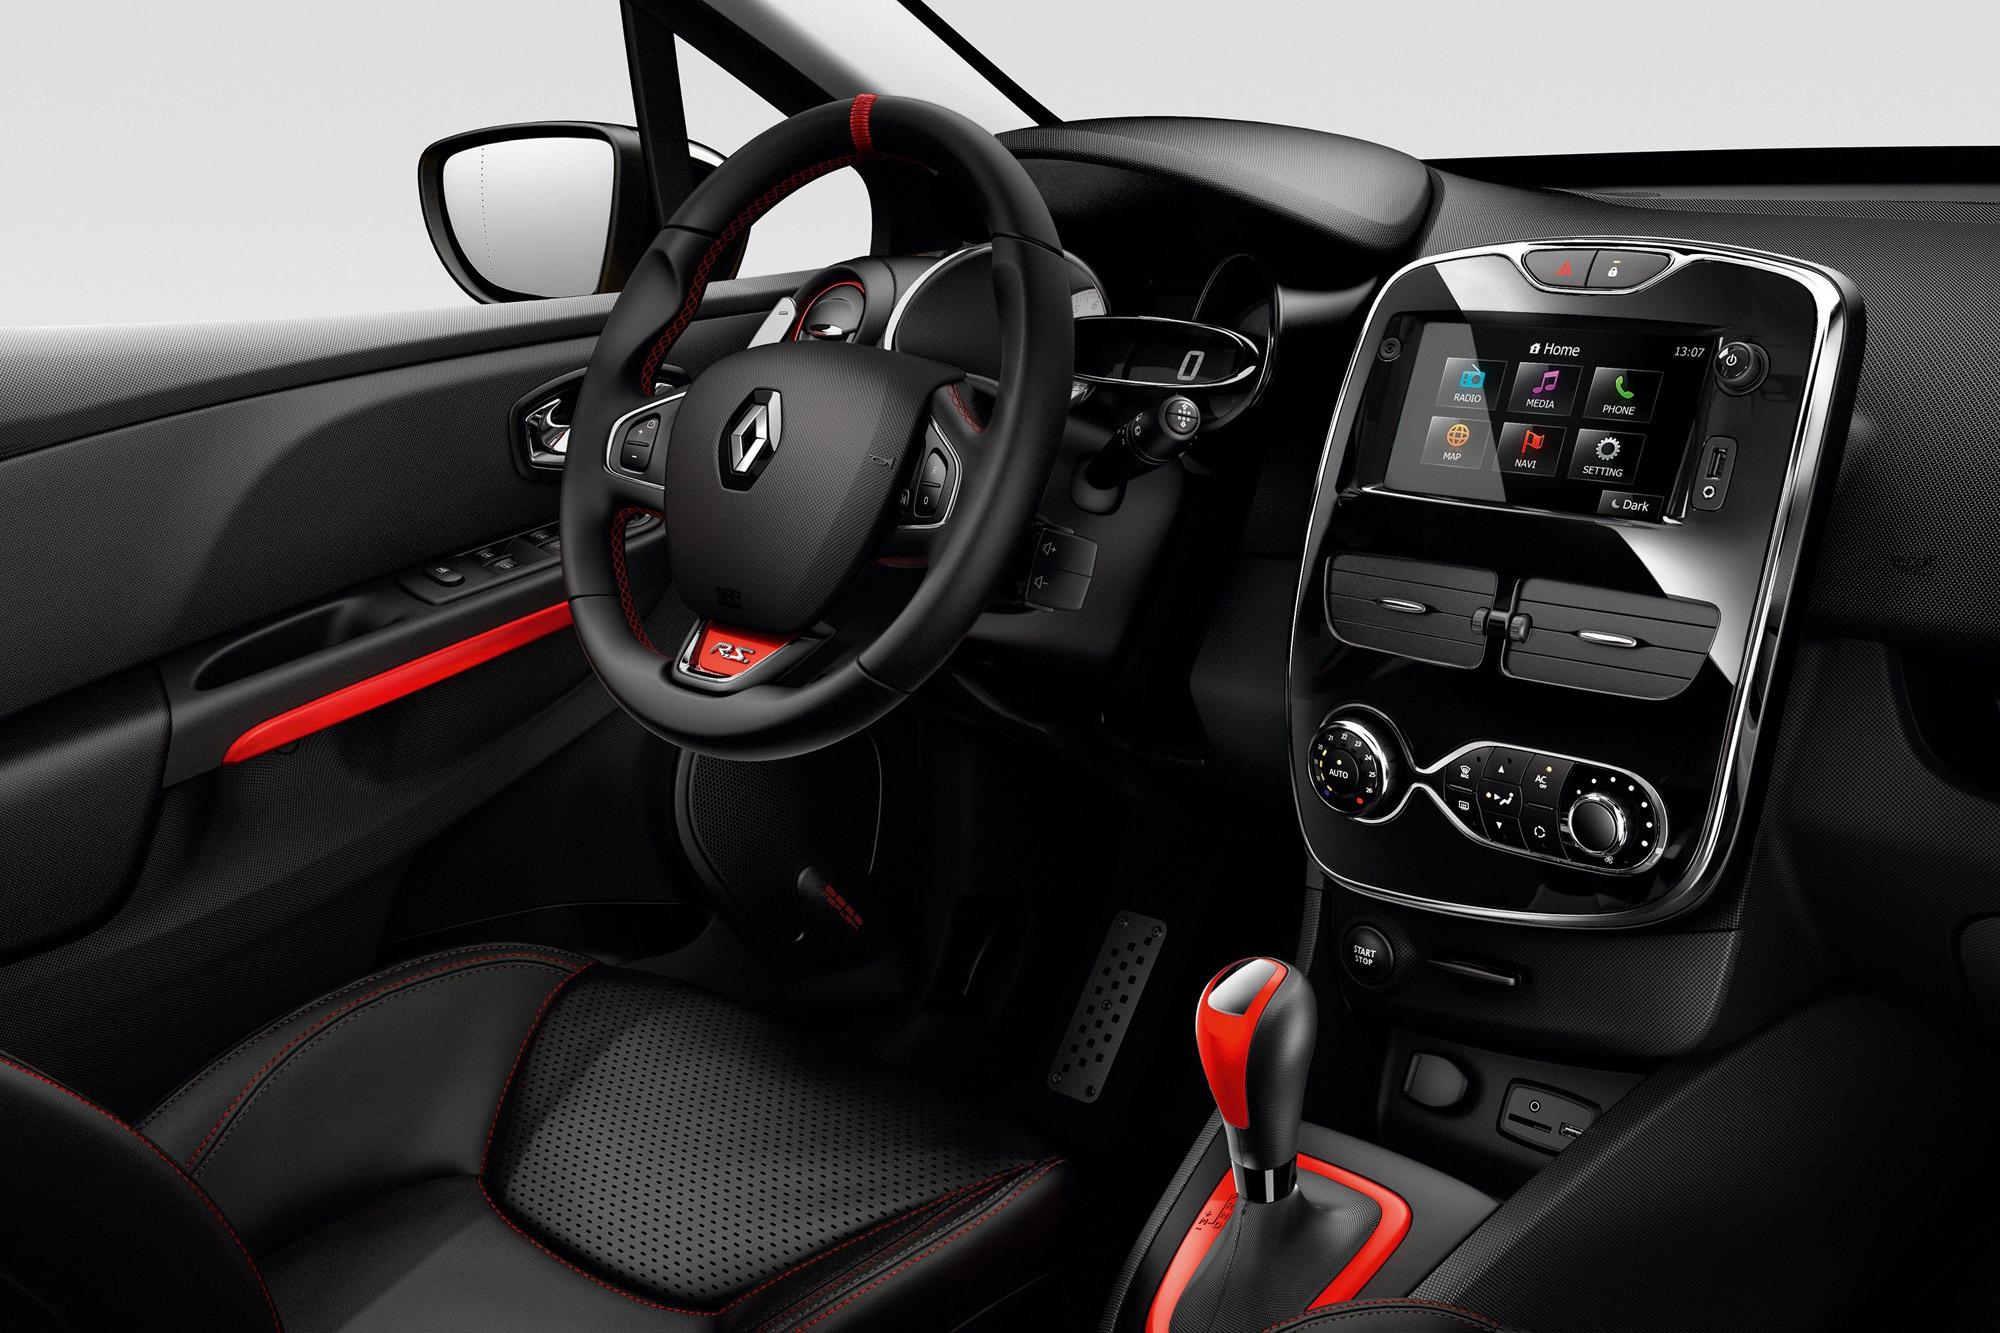 Sportlenkrad im Renault Clio R.S.